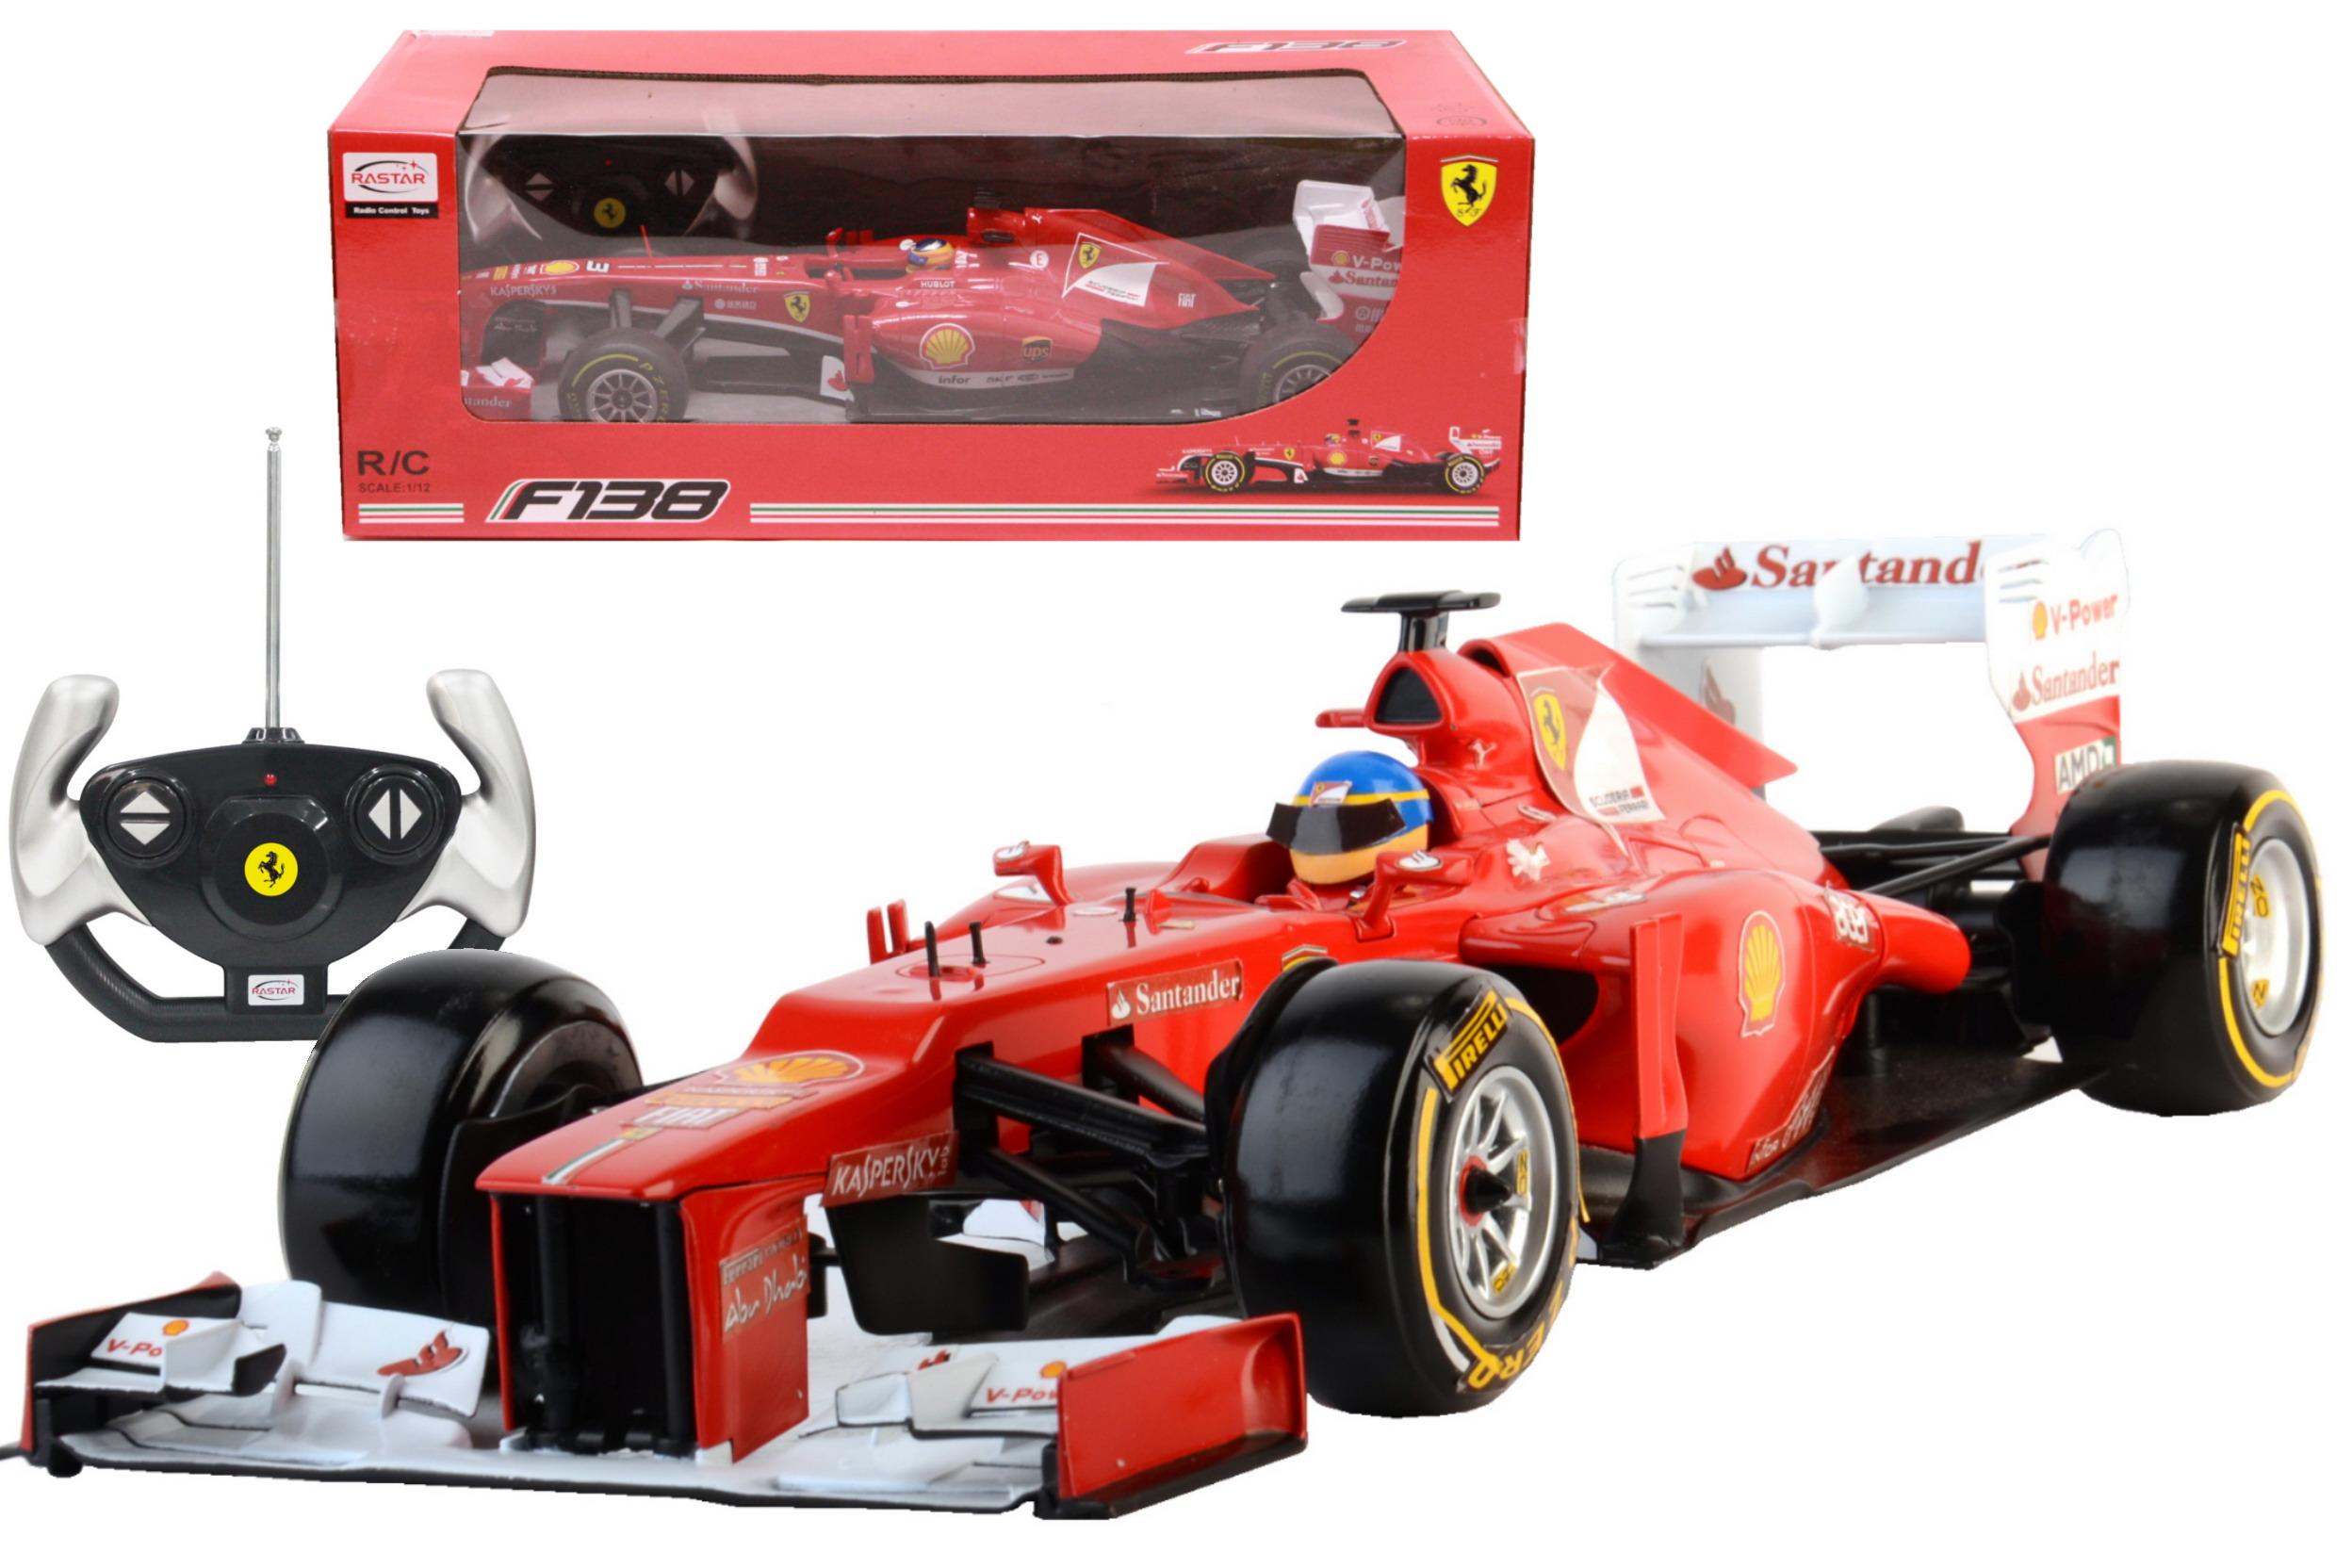 R/C Ferrari F1 Racing Car 1:12sc In Window Box